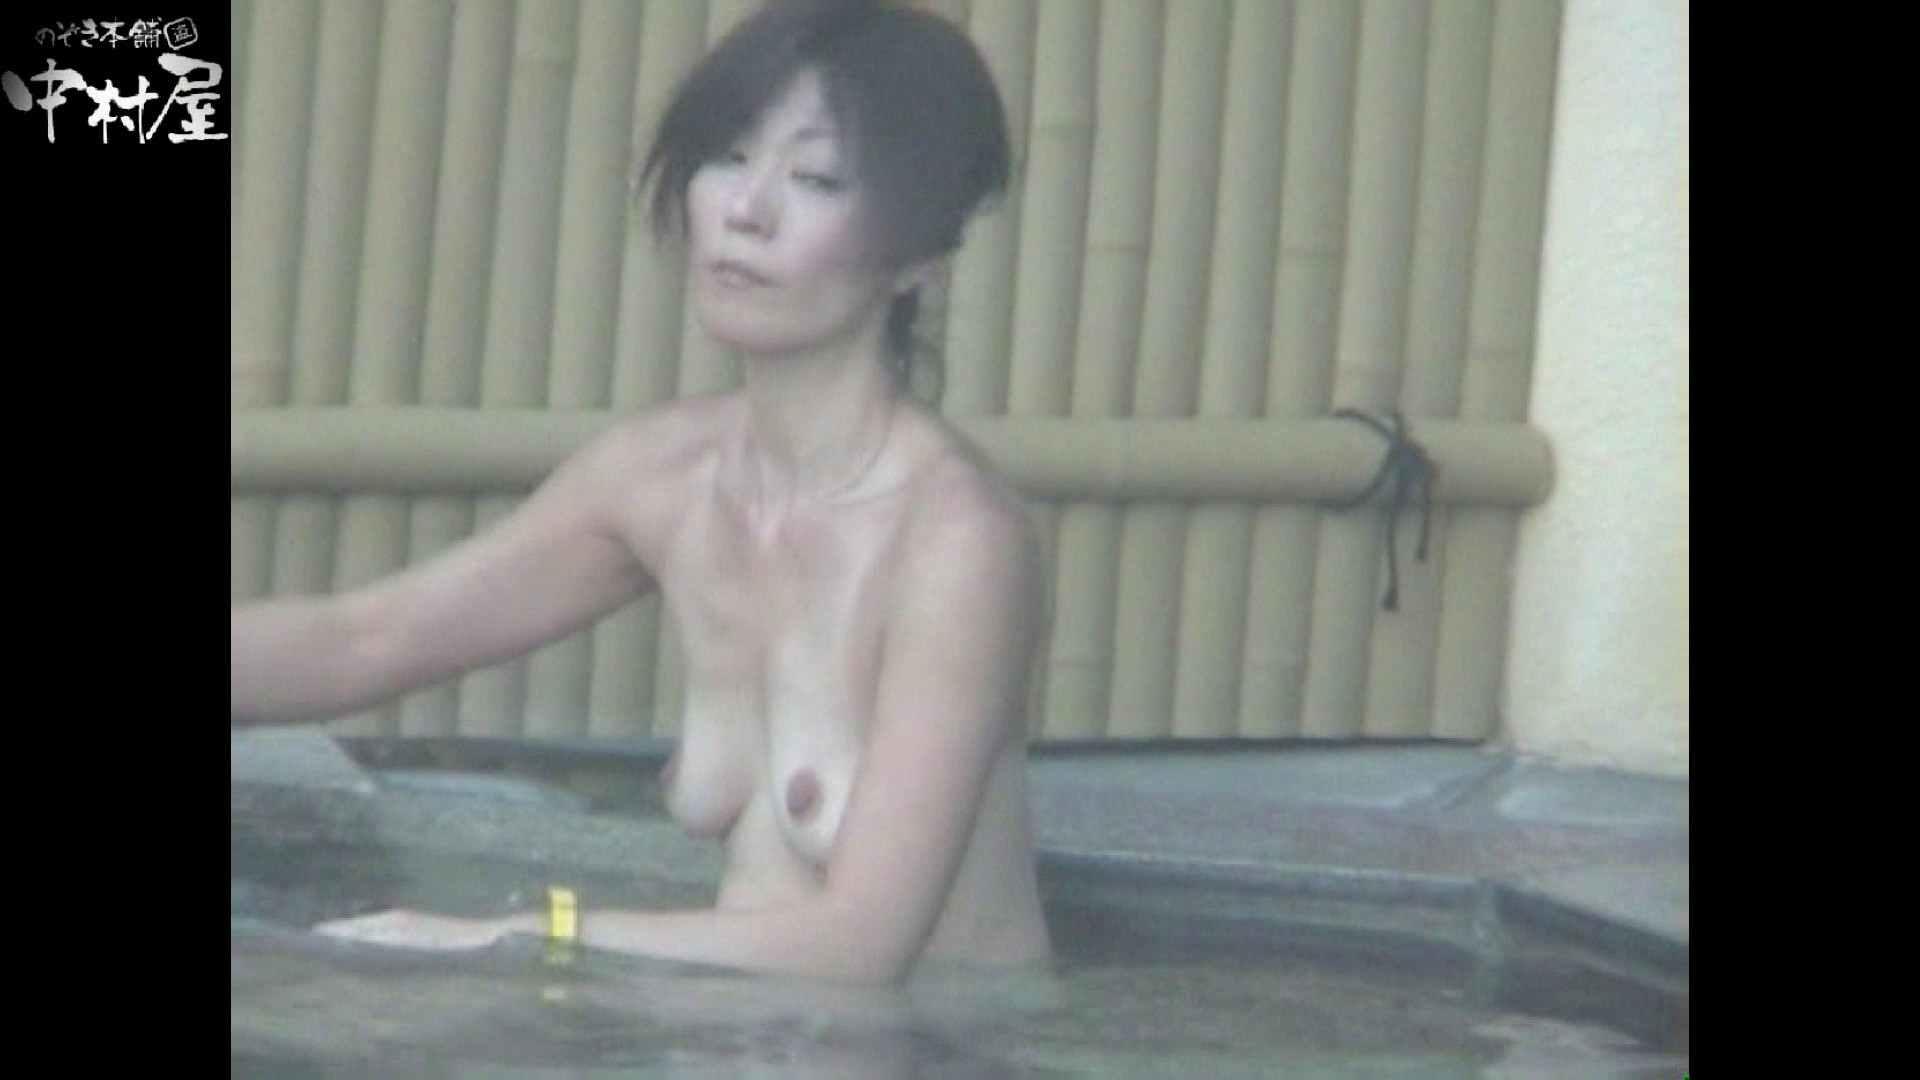 Aquaな露天風呂Vol.972 露天   OLセックス  80画像 16